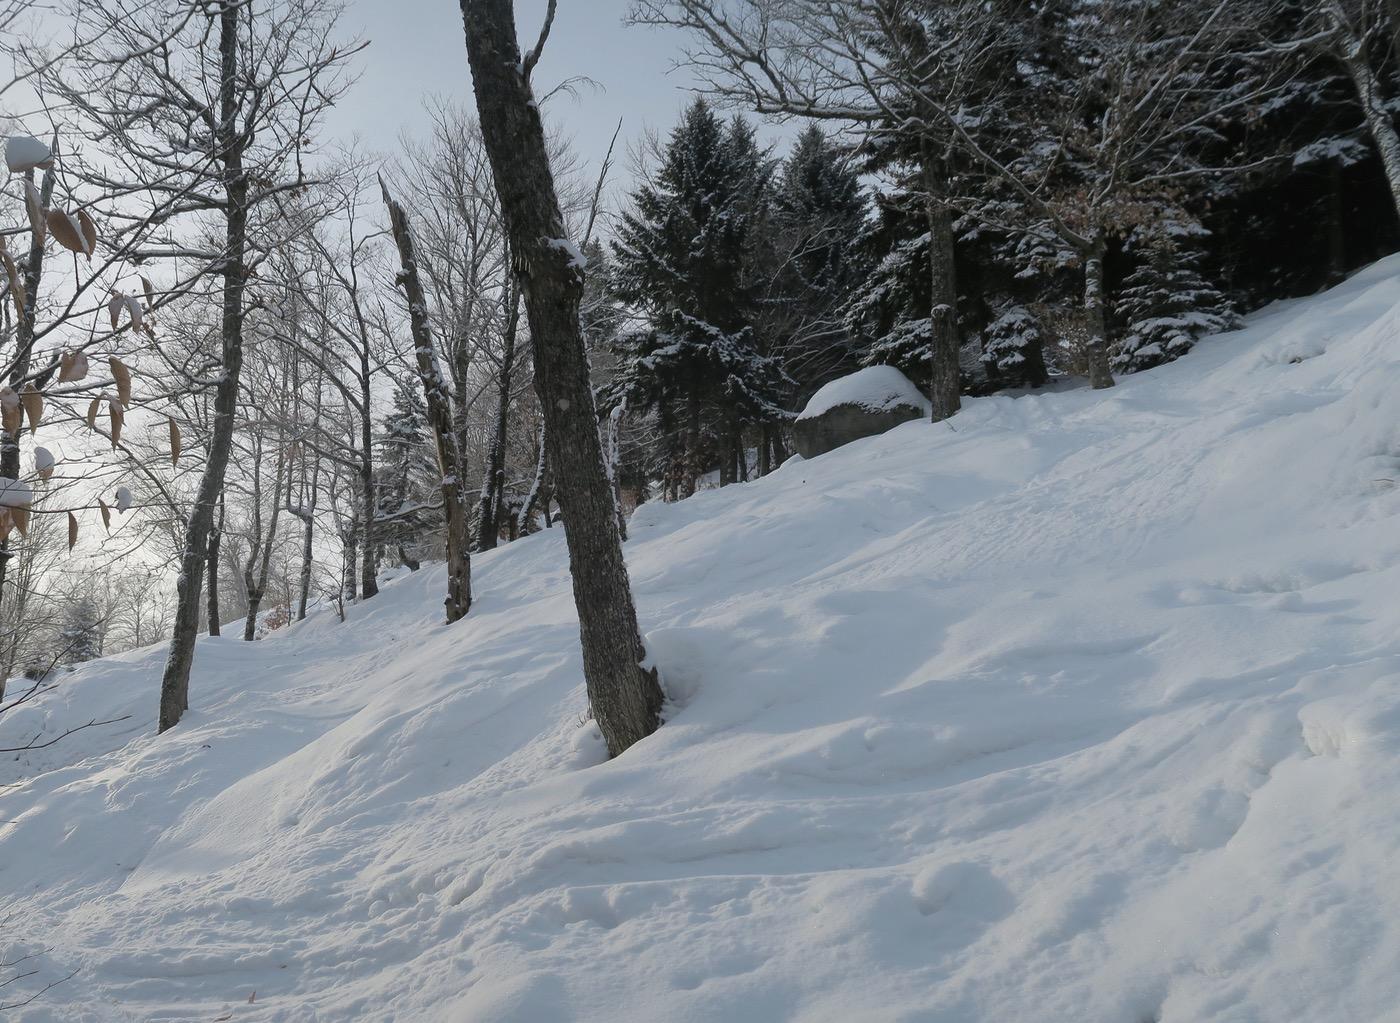 McCauley terrain